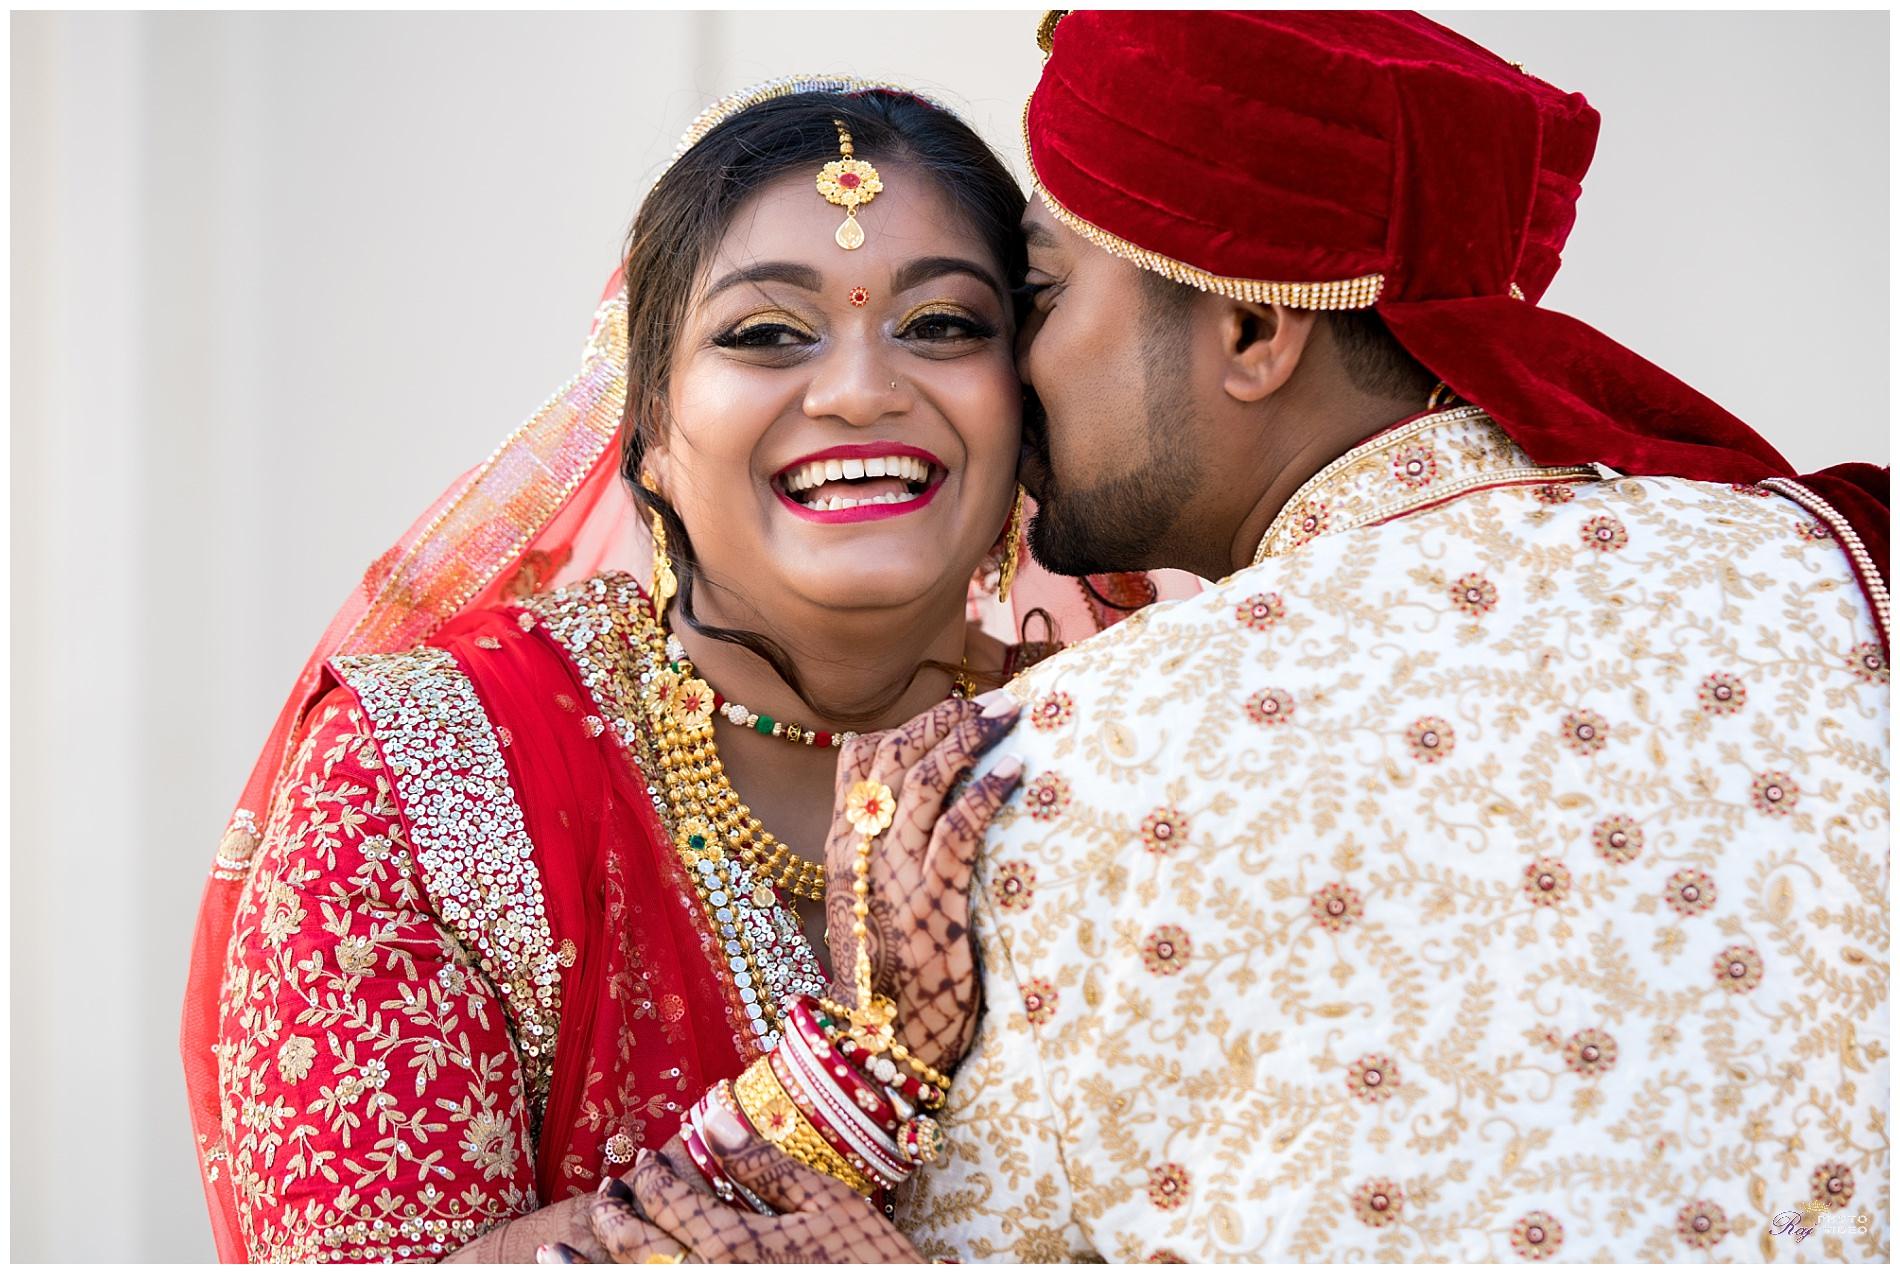 doubletree-by-hilton-hotel-wilmington-de-wedding-krishna-ritesh-31.jpg